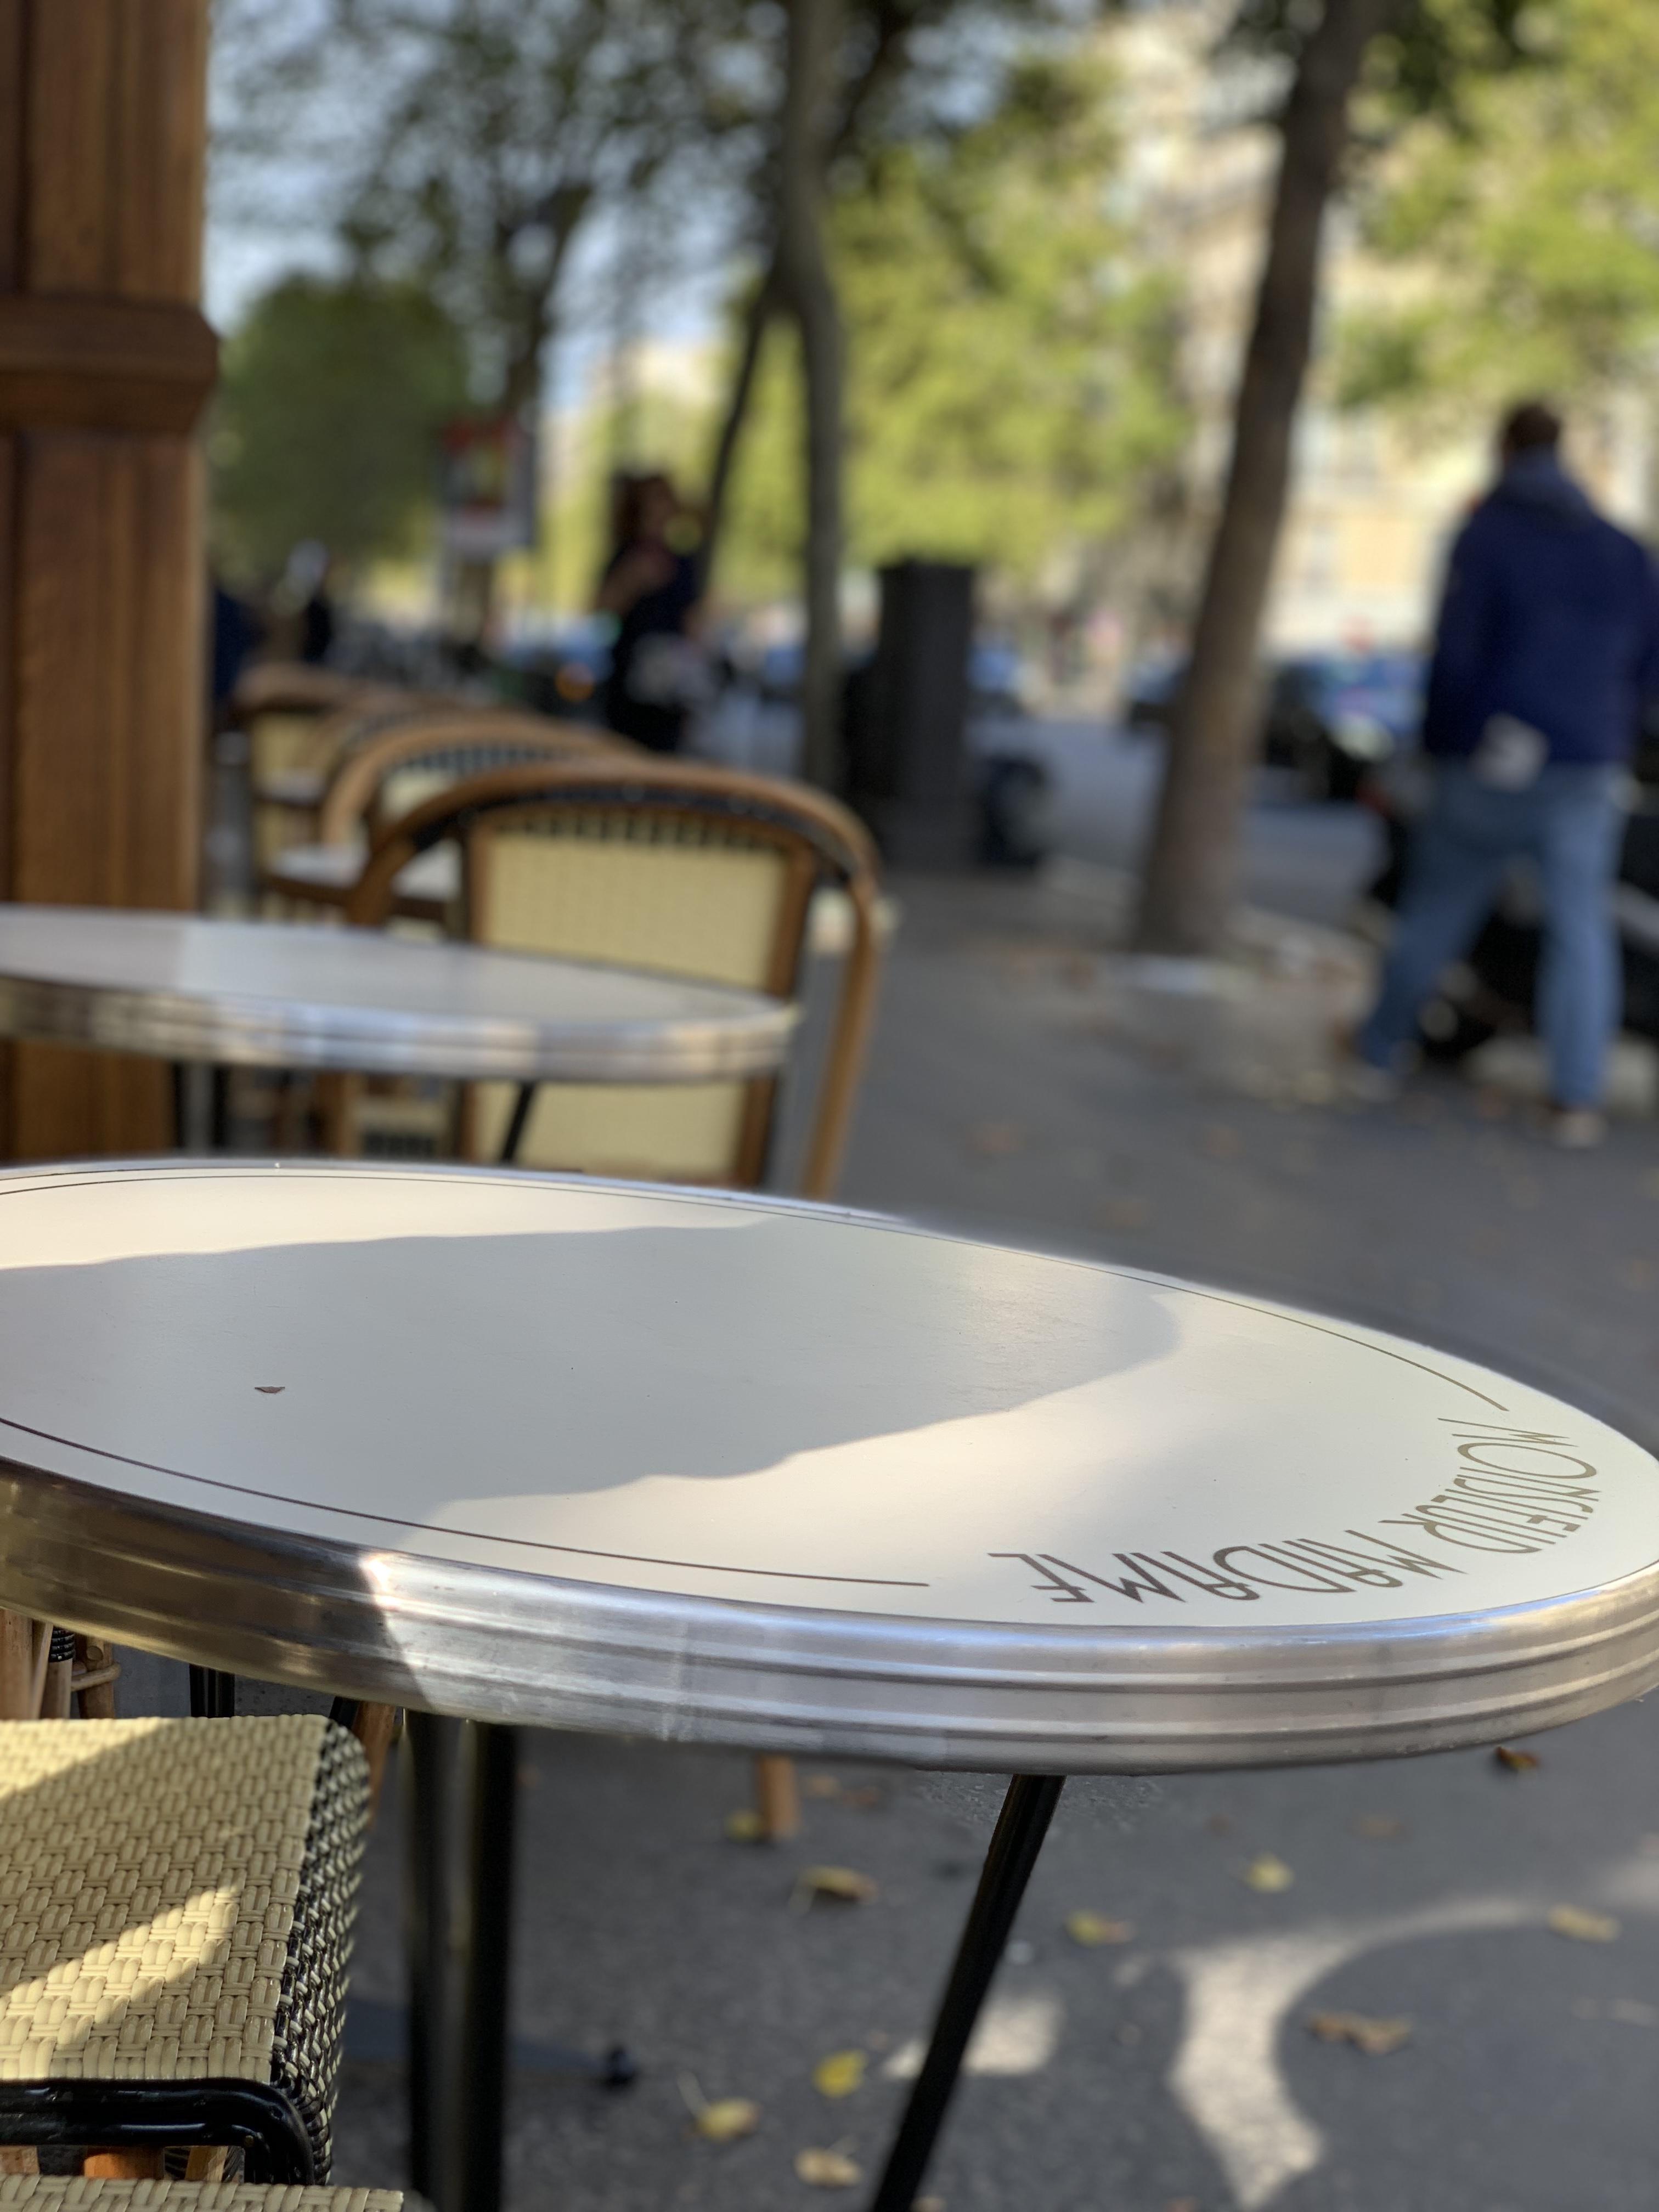 img 2652 - Paris Travel Guide